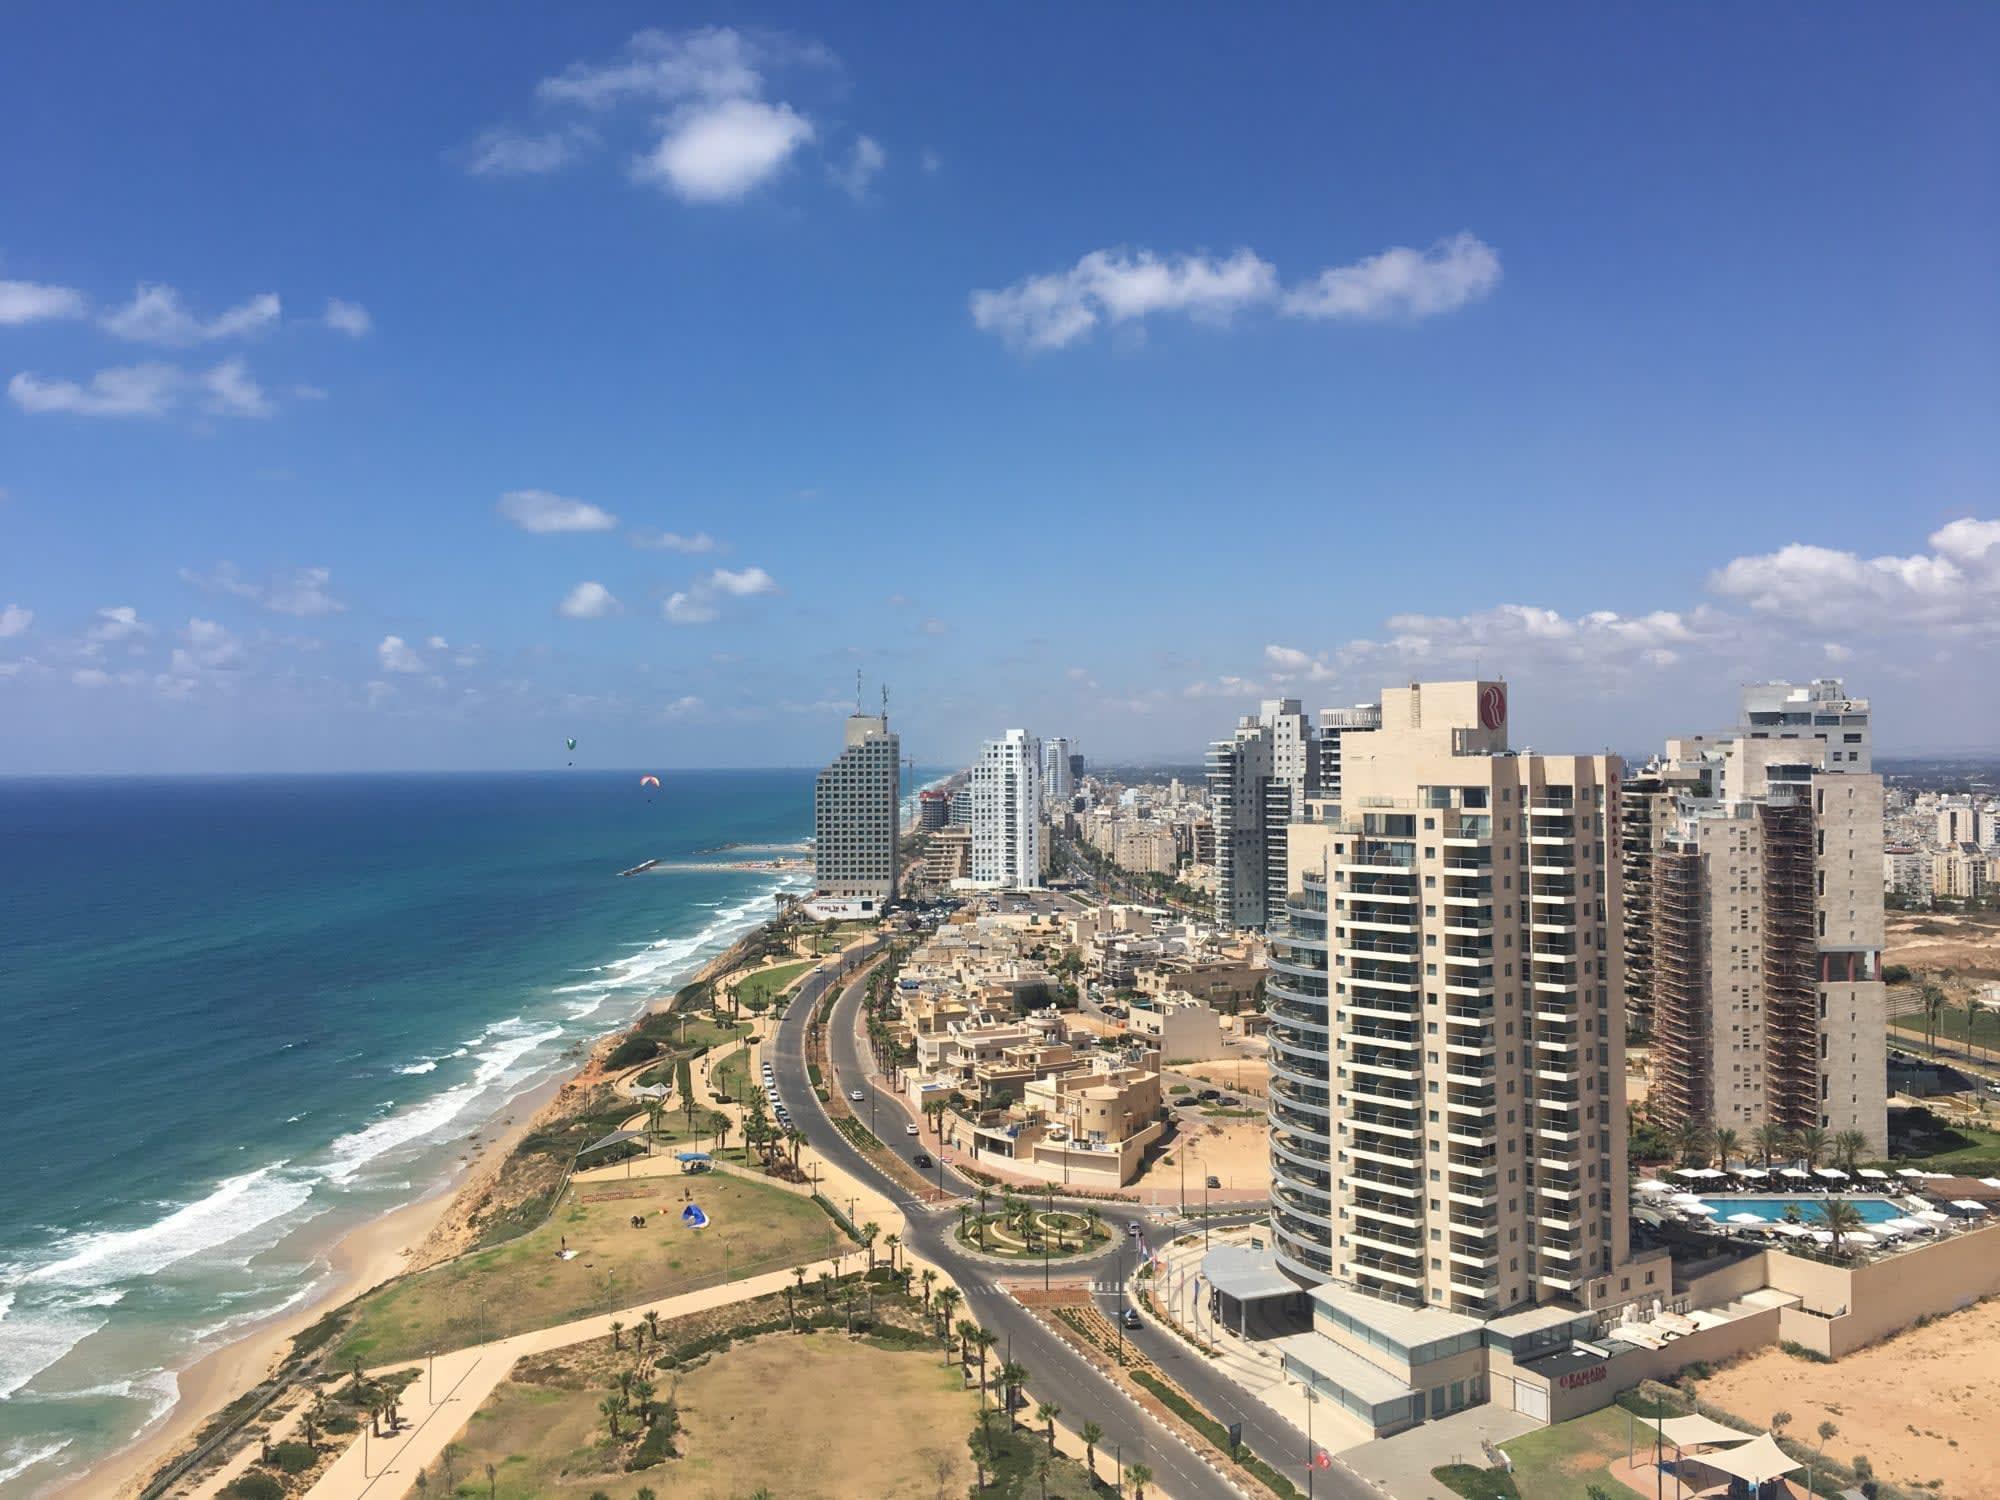 View from The Island Hotel in Netanya, Israel